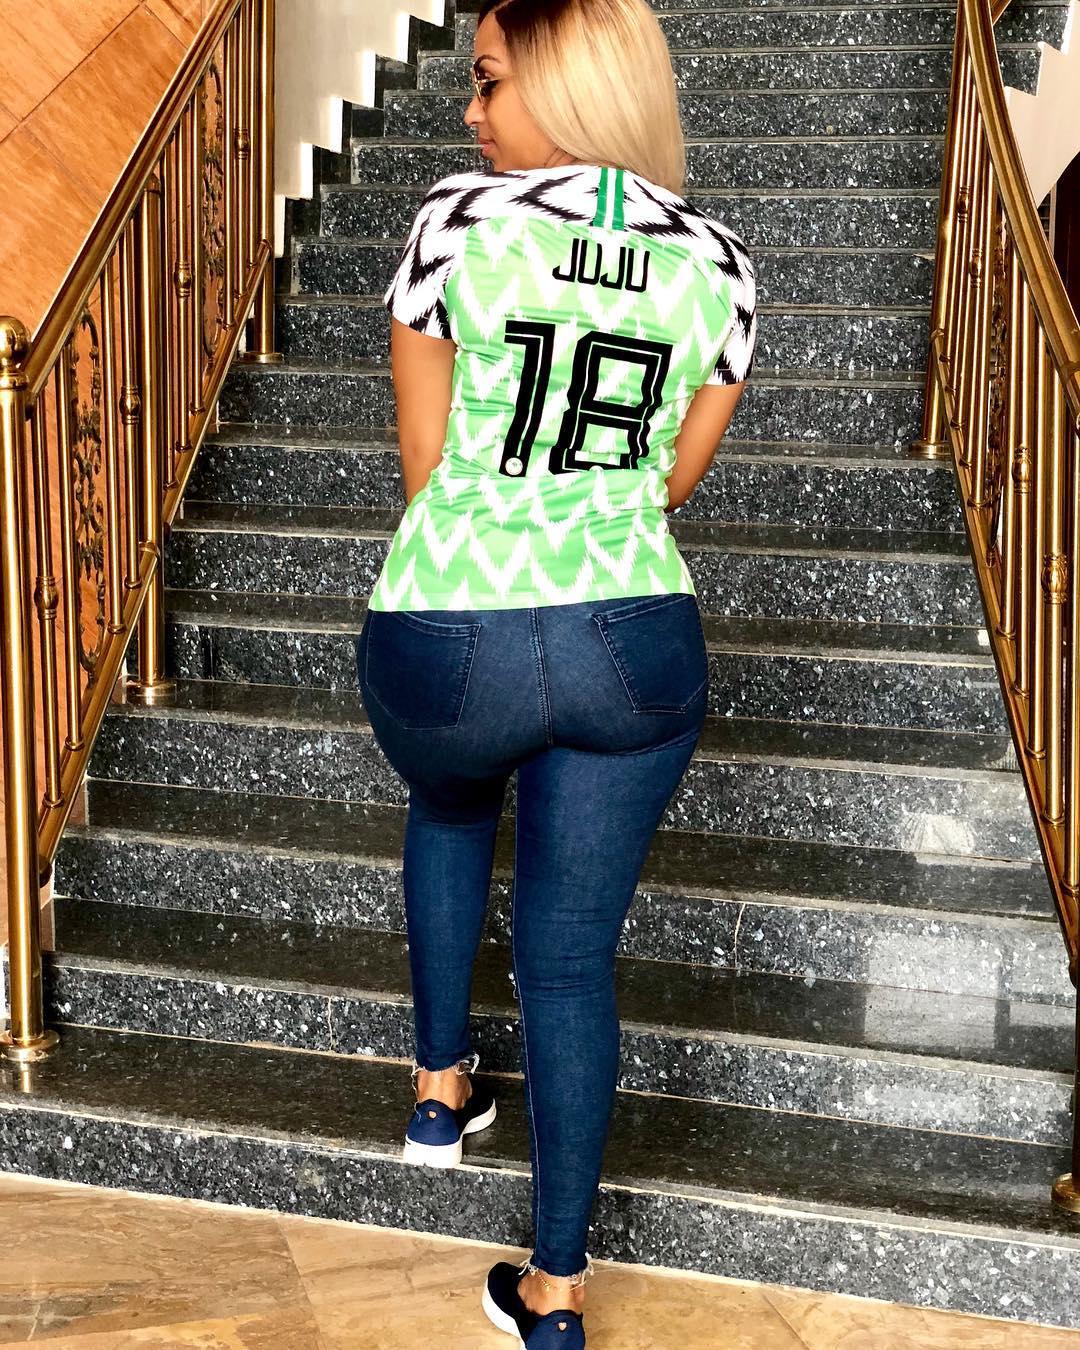 963f17841a4 PHOTOS  Nigerian Celebrities Rock Super Eagles Jersey ⋆